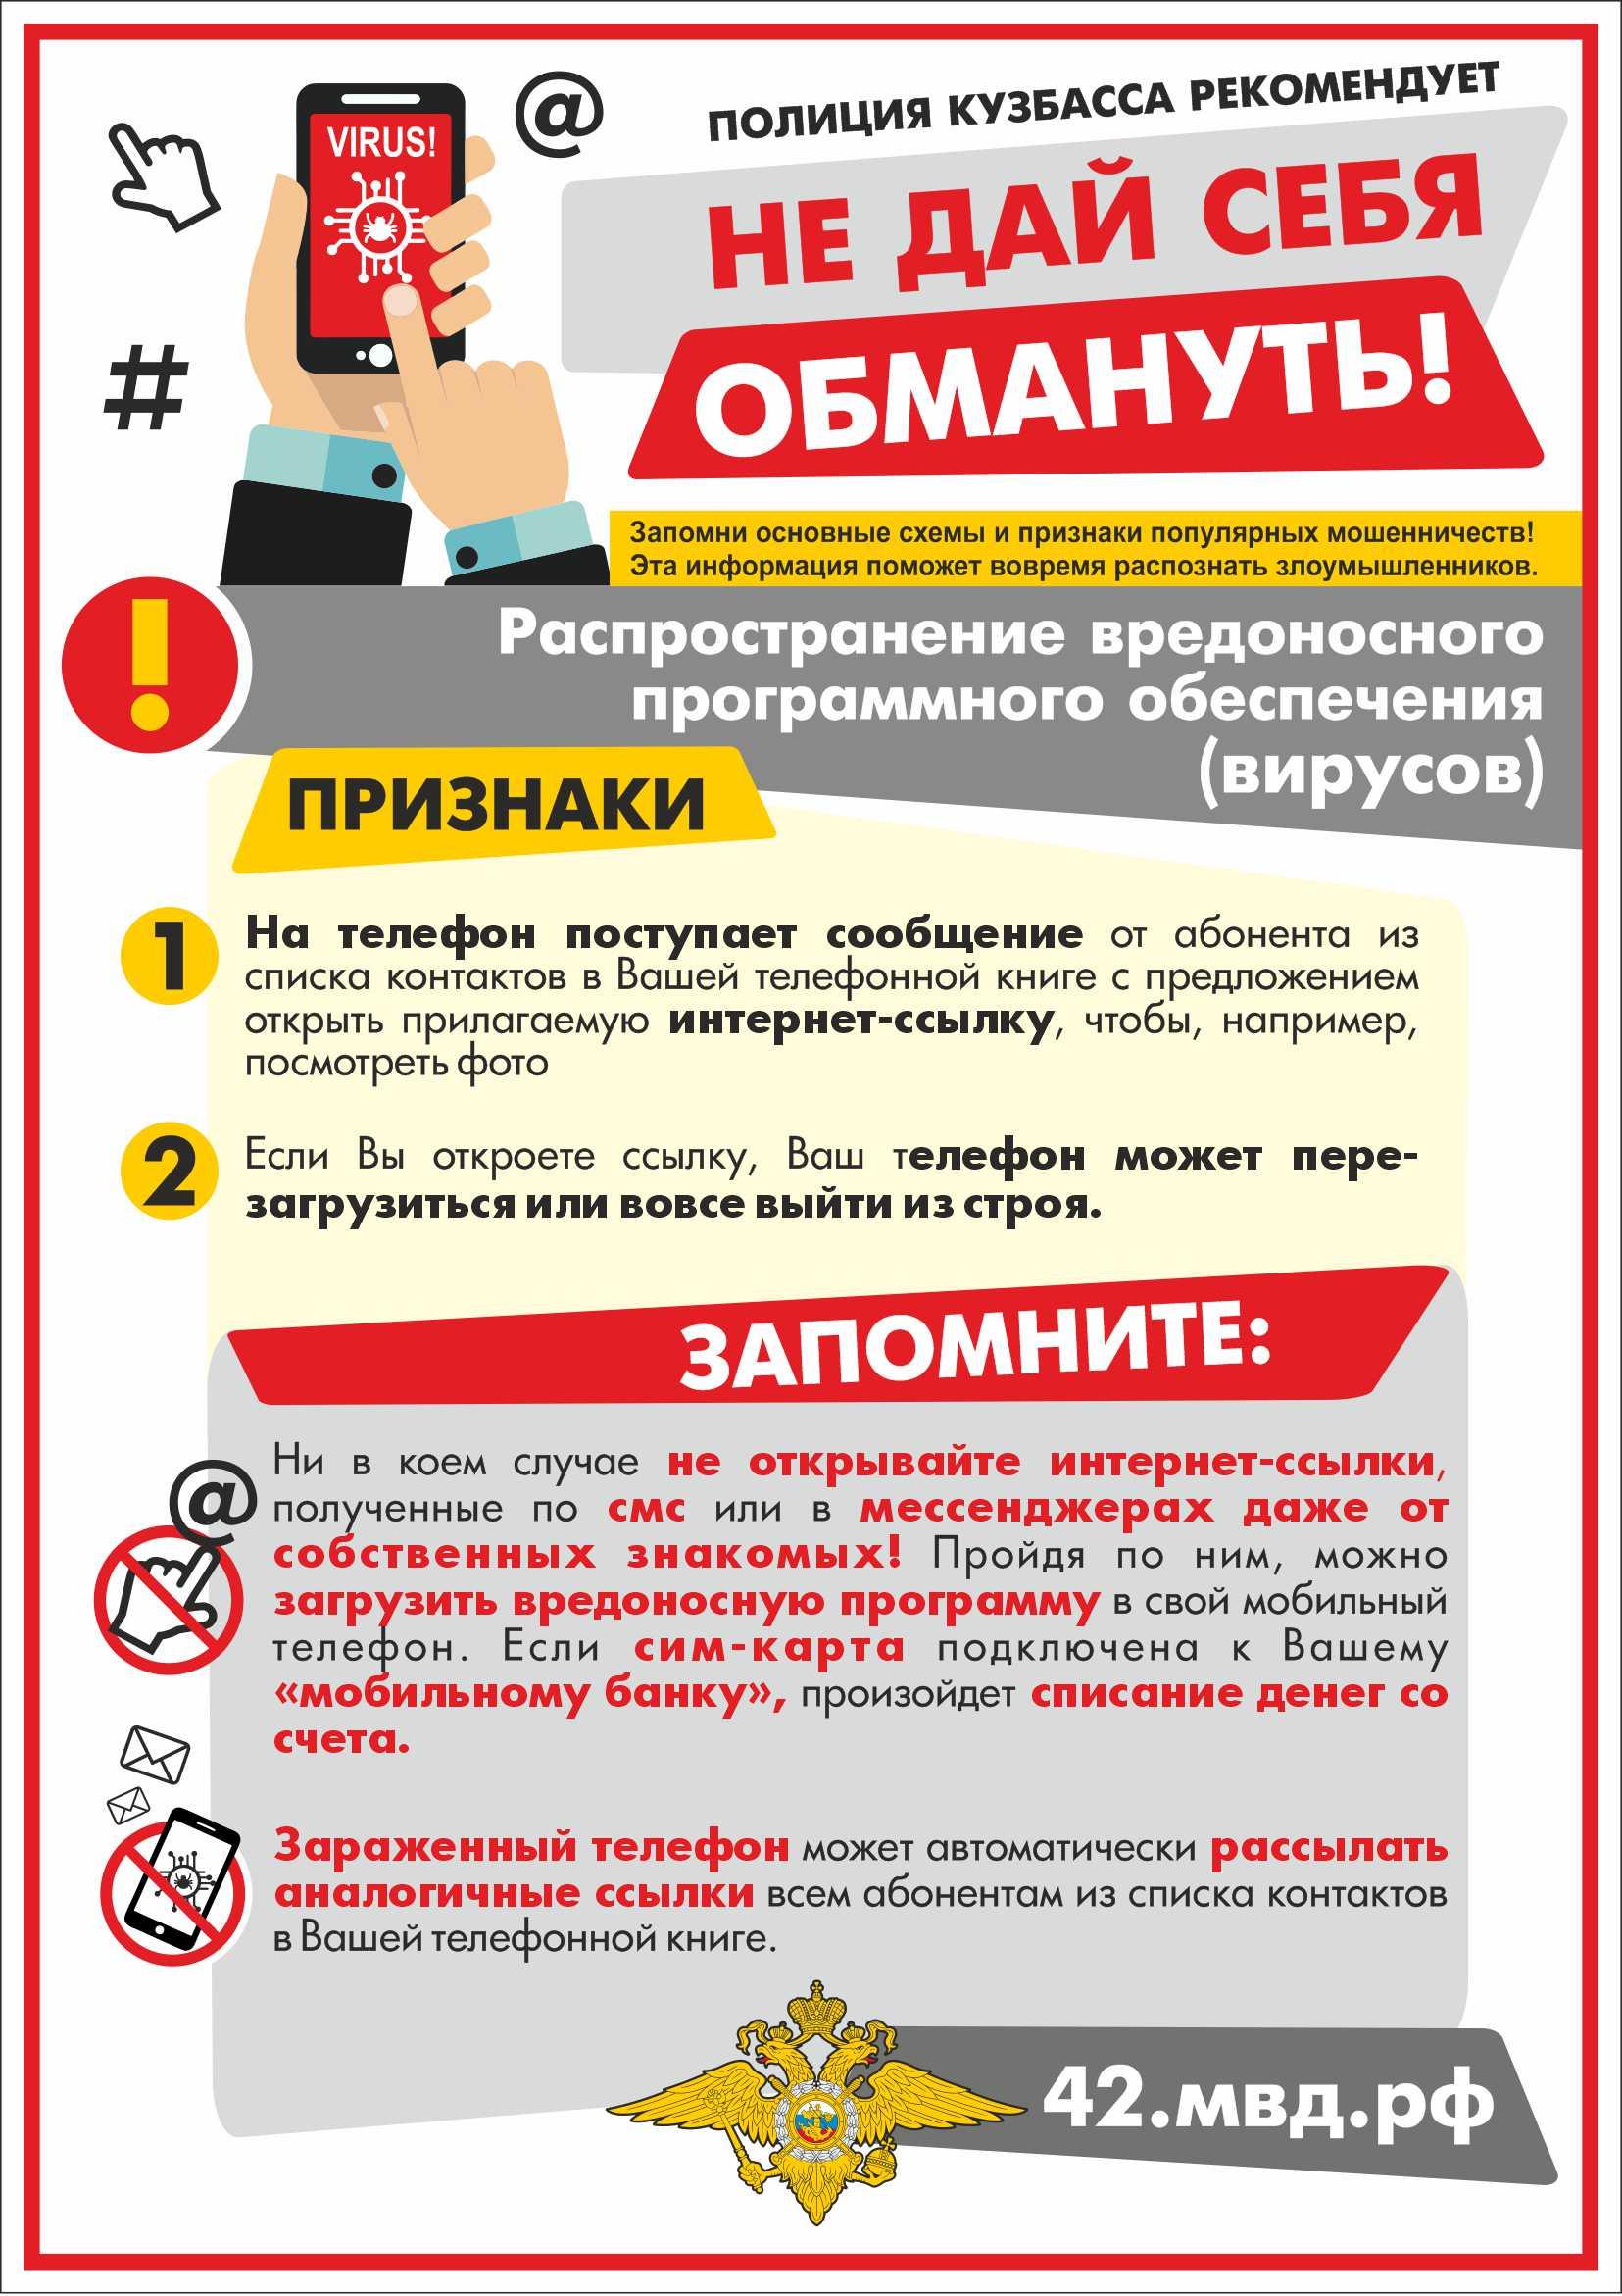 мошенники_3